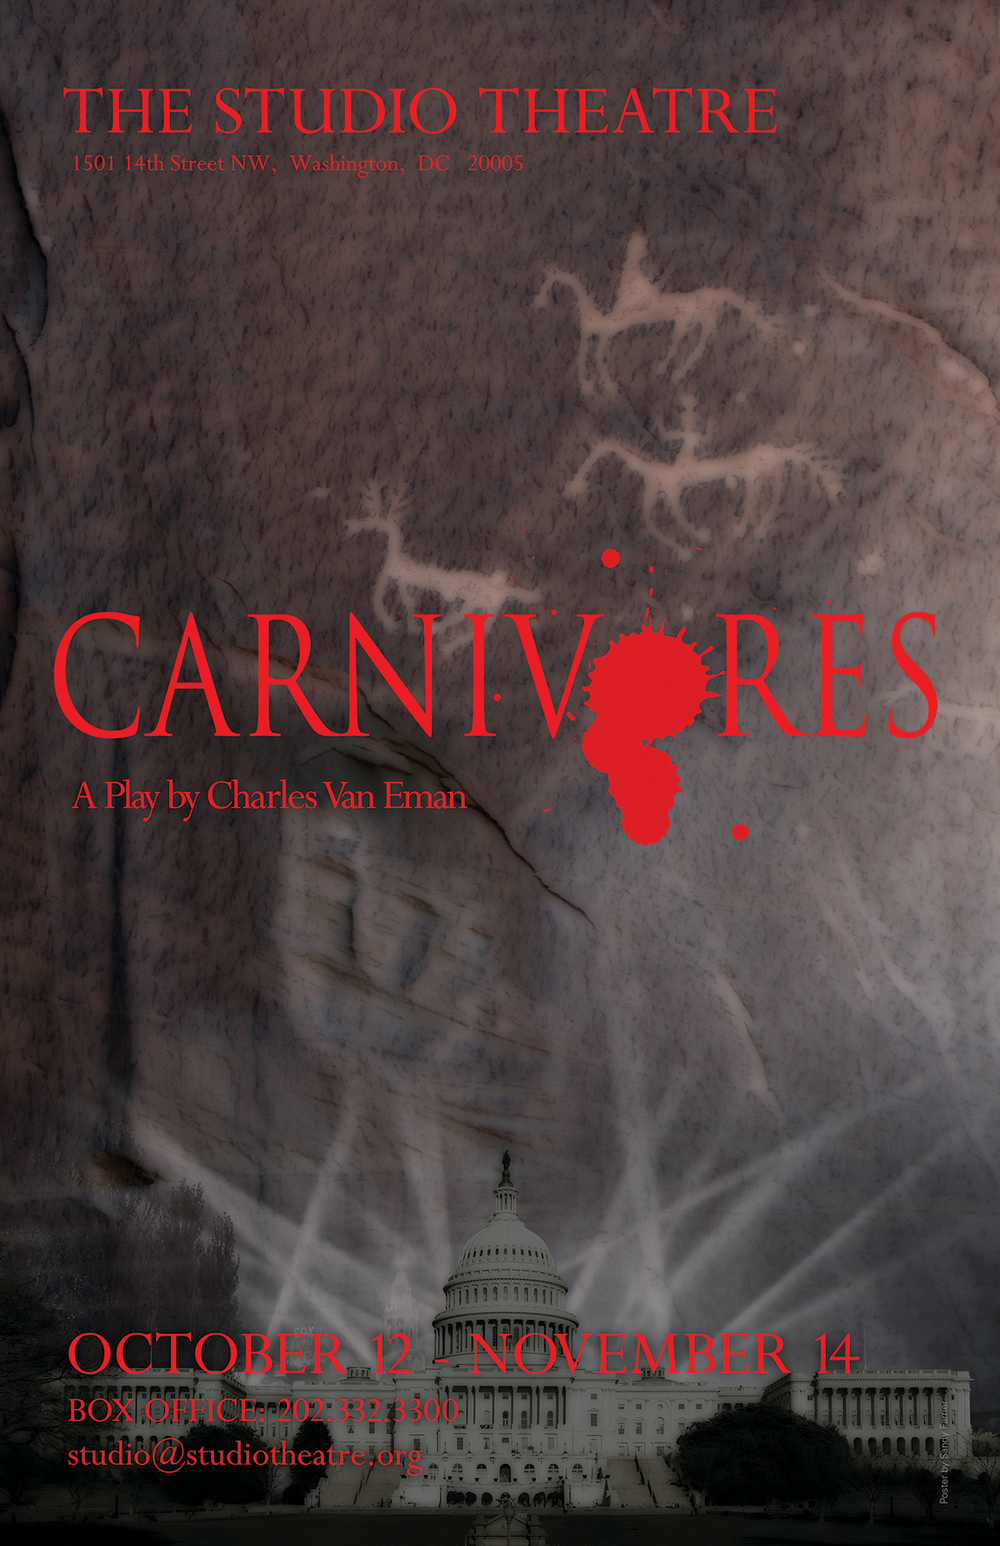 CARNIVORES_flat.jpg